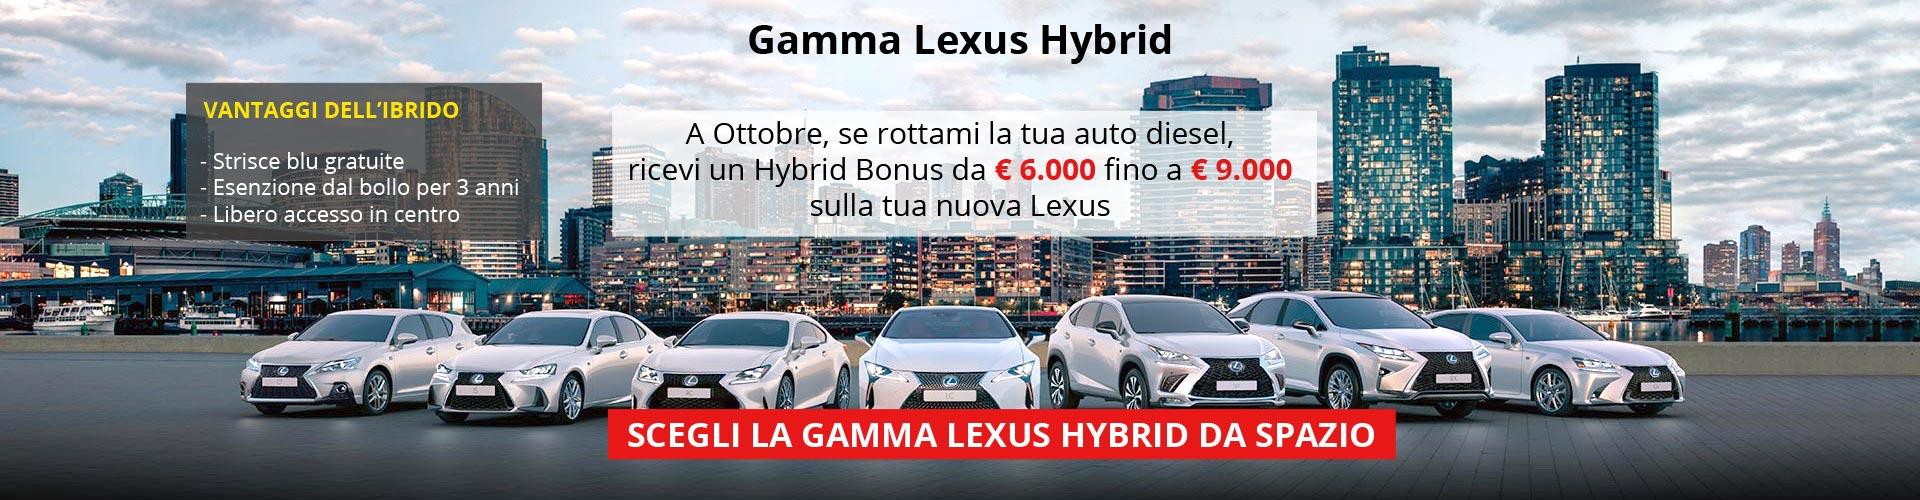 Gamma Lexus  Hybrid